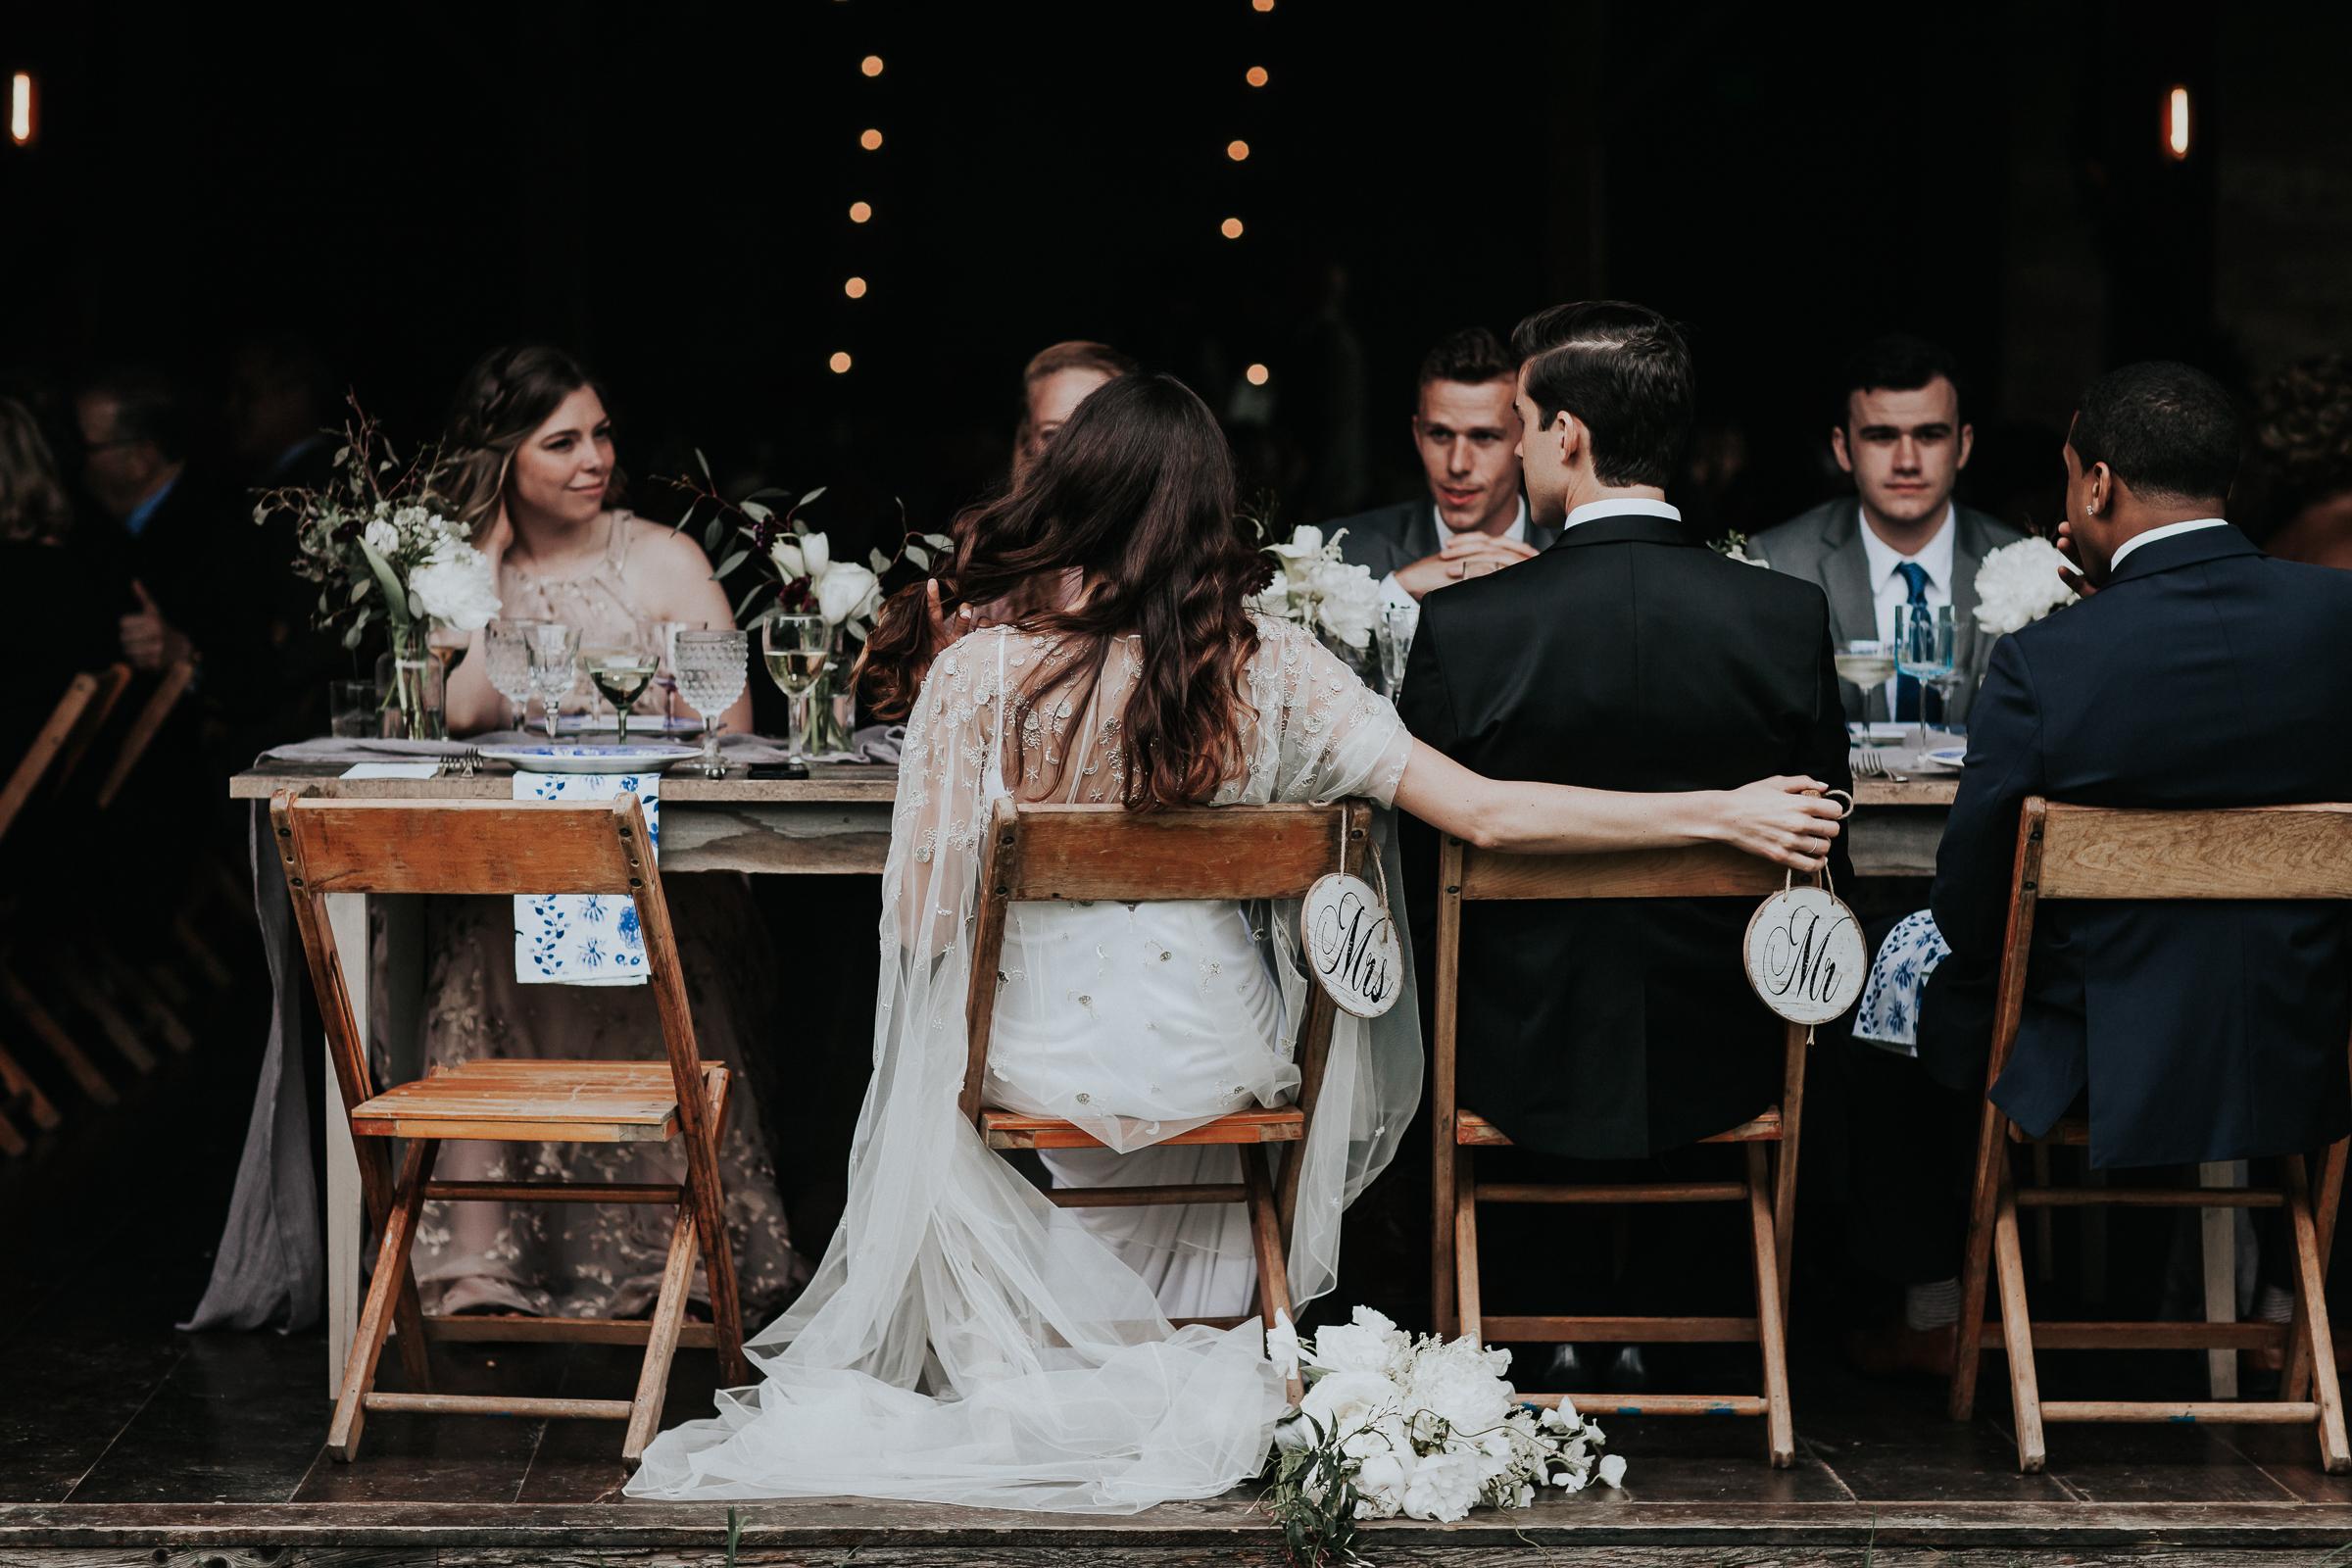 Handsome-Hollow-Long-Eddy-Catskills-New-York-Fine-Art-Documentary-Wedding-Photographer-107.jpg